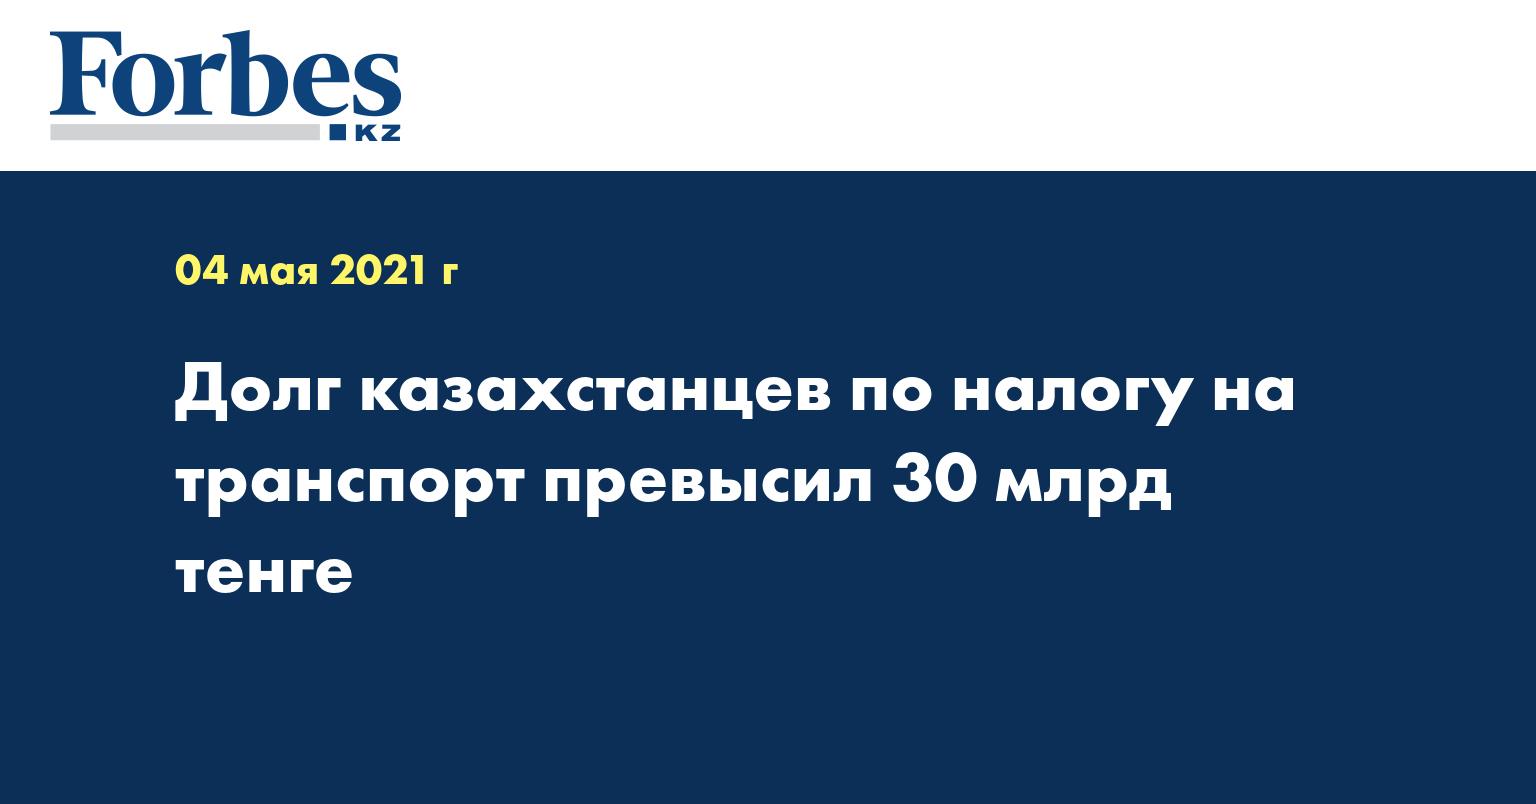 Долг казахстанцев по налогу на транспорт превысил 30 млрд тенге